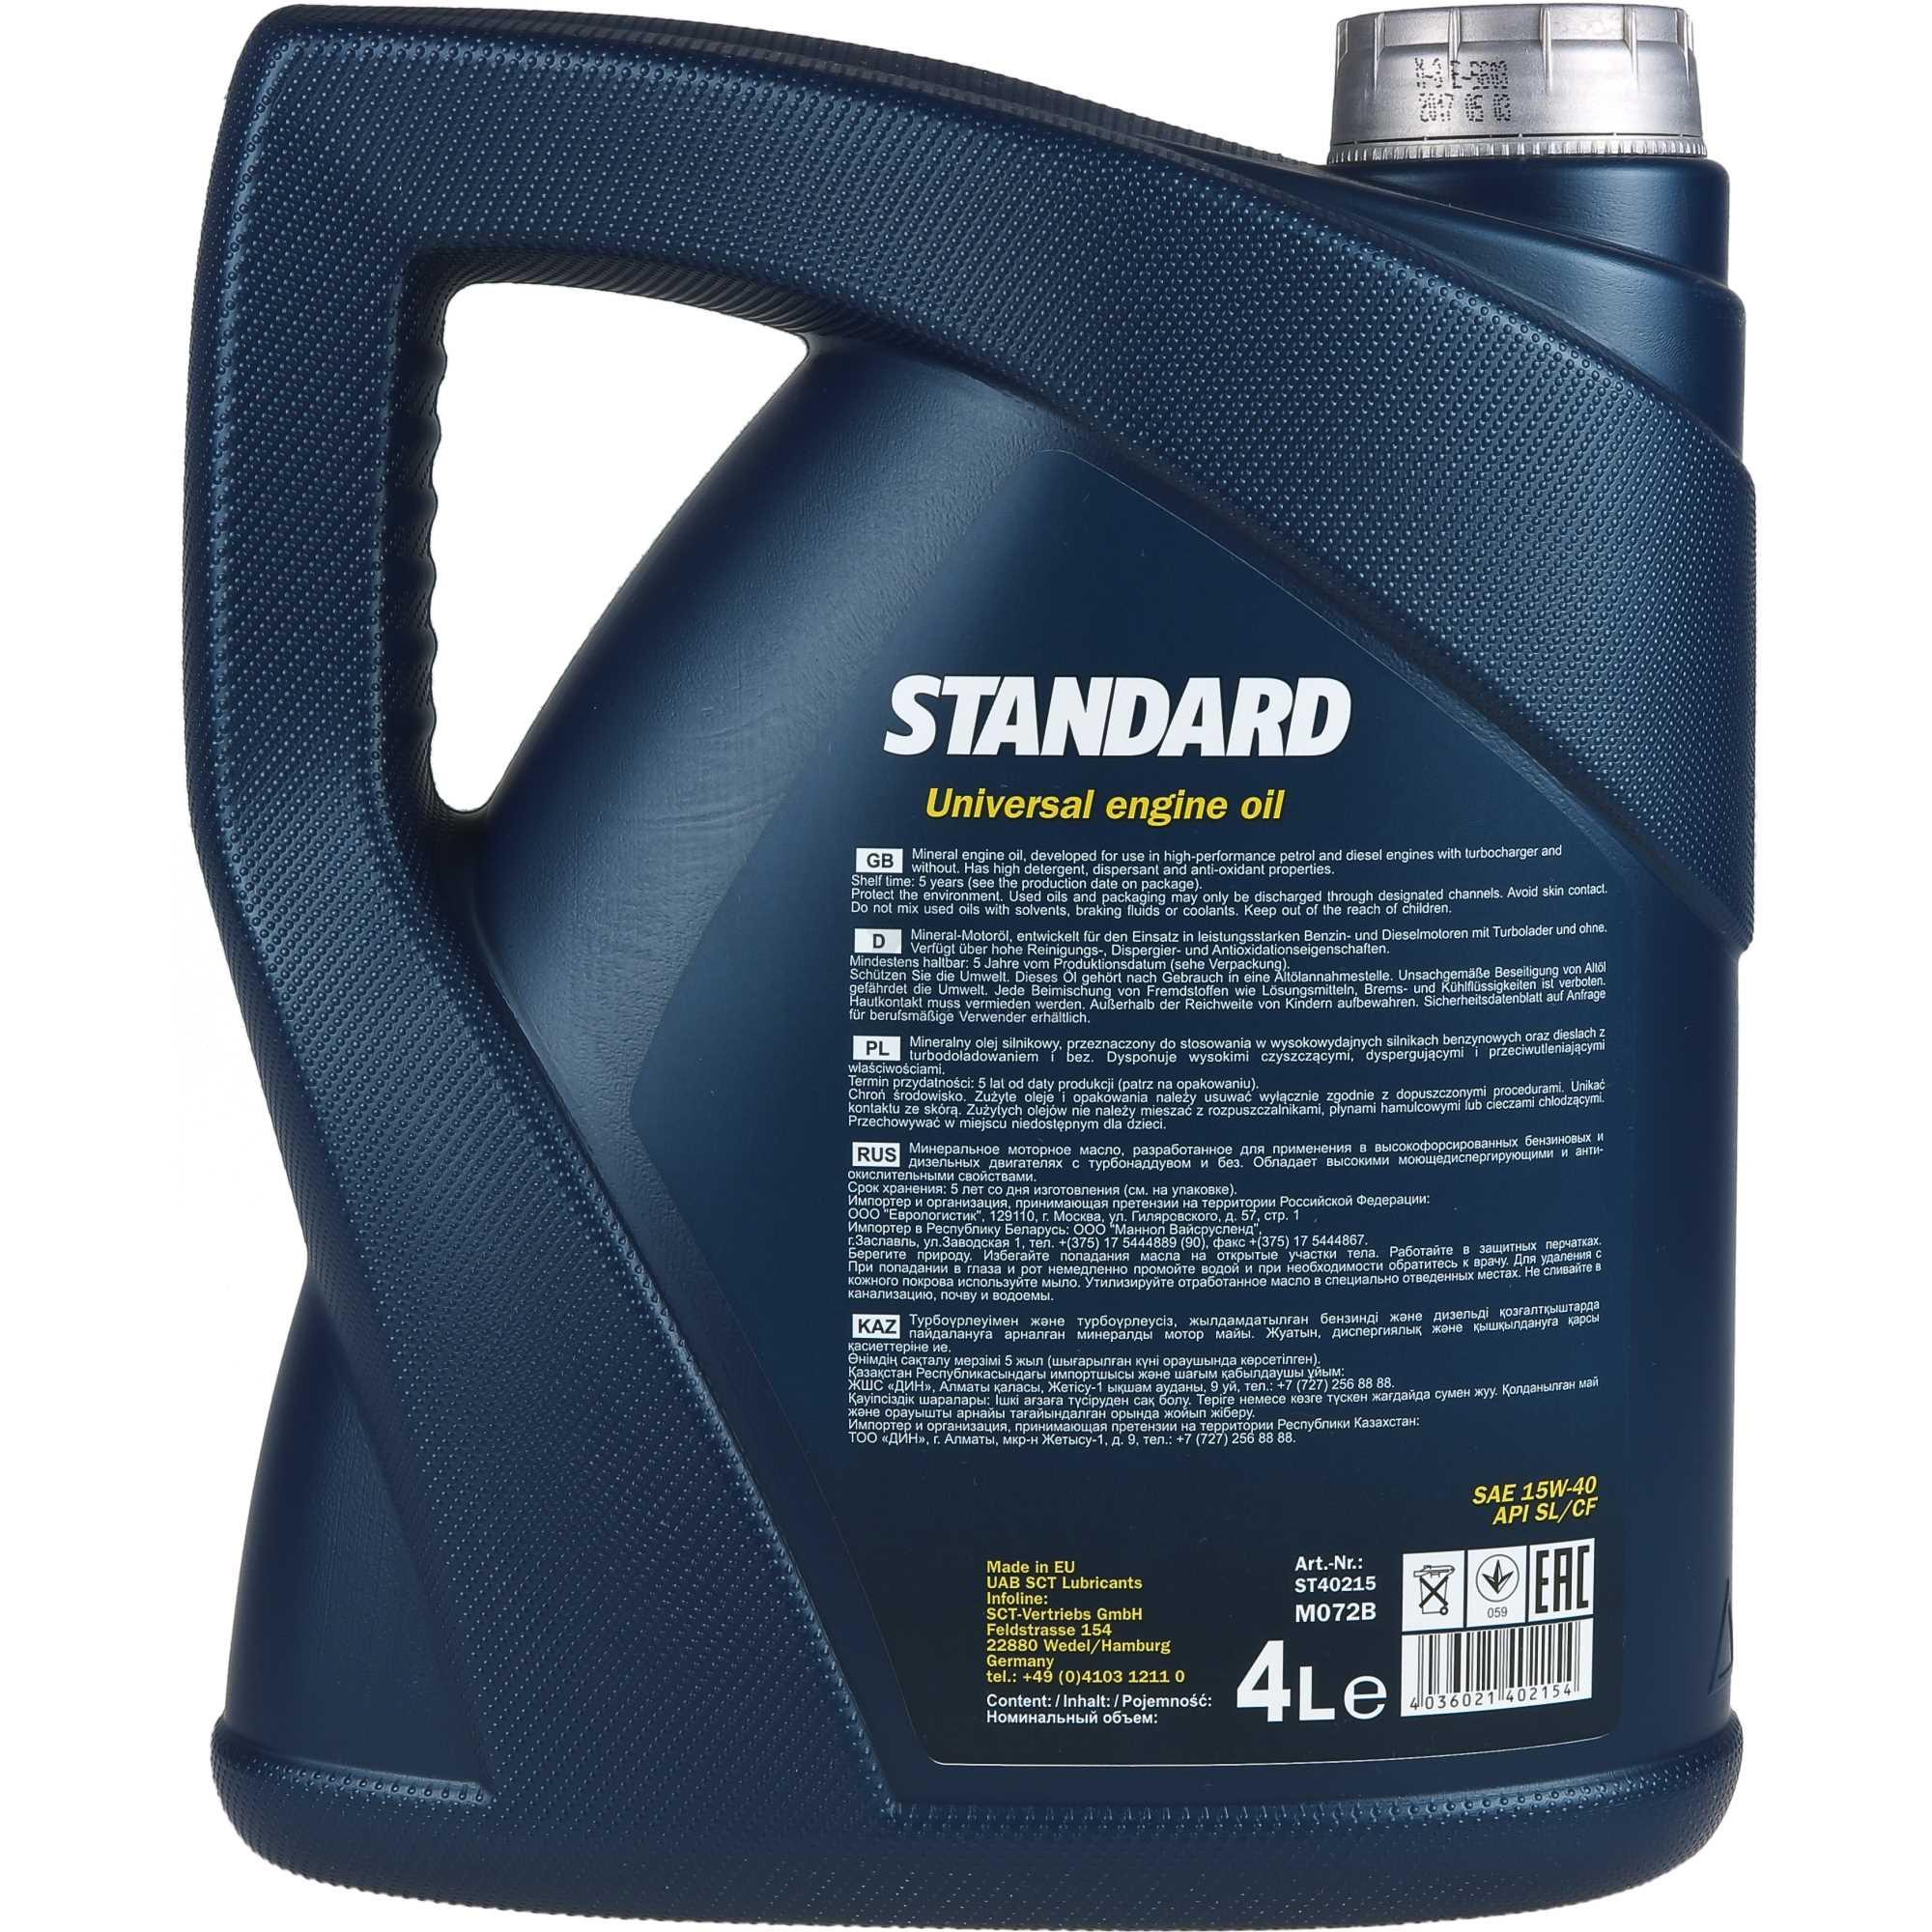 Aceite-del-motor-aceite-5w40-10w40-15w40-5w30-10w60-1l-4l-5l-7l-10l-20l miniatura 71